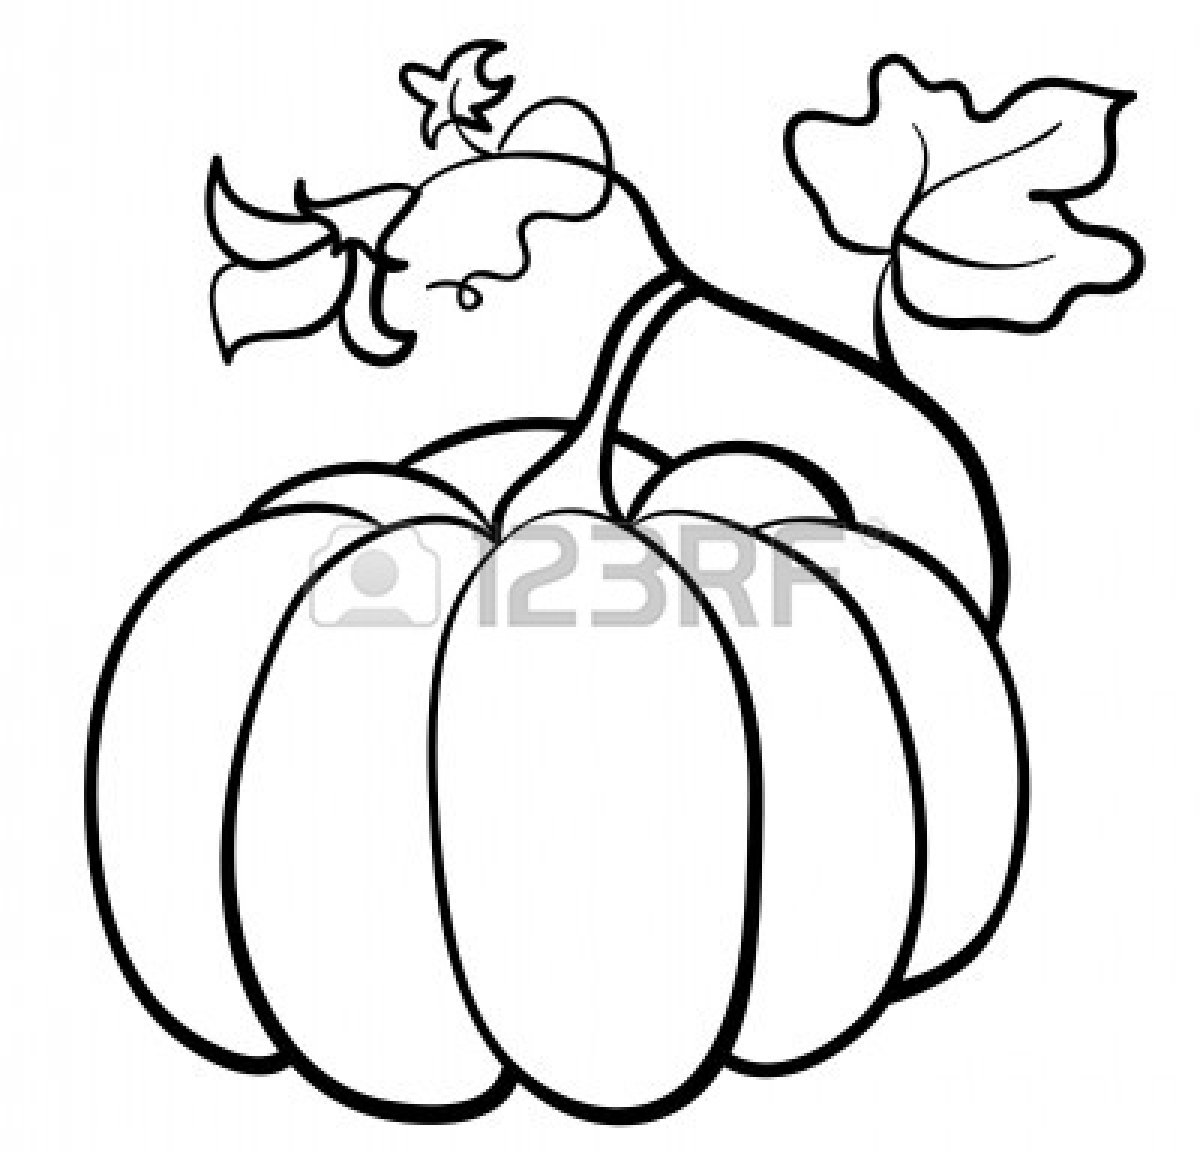 pumpkin clip art free black and white - photo #33